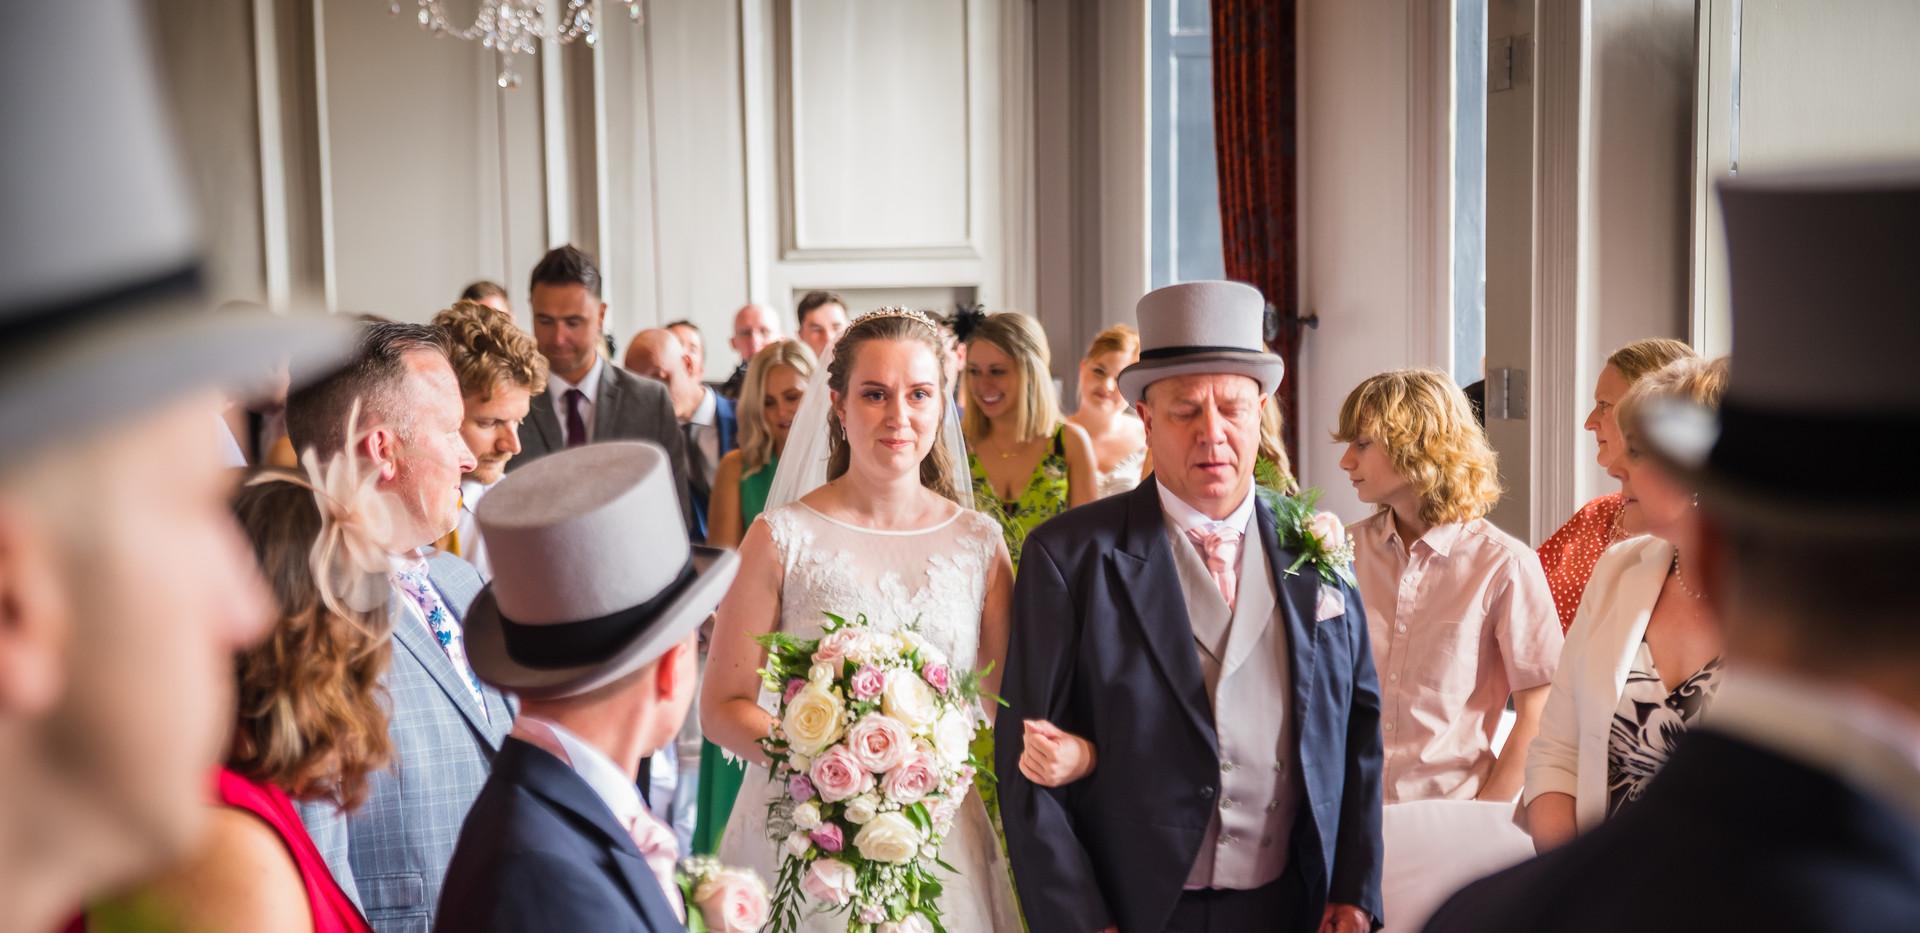 Oddfellows Wedding Photography___9.jpg